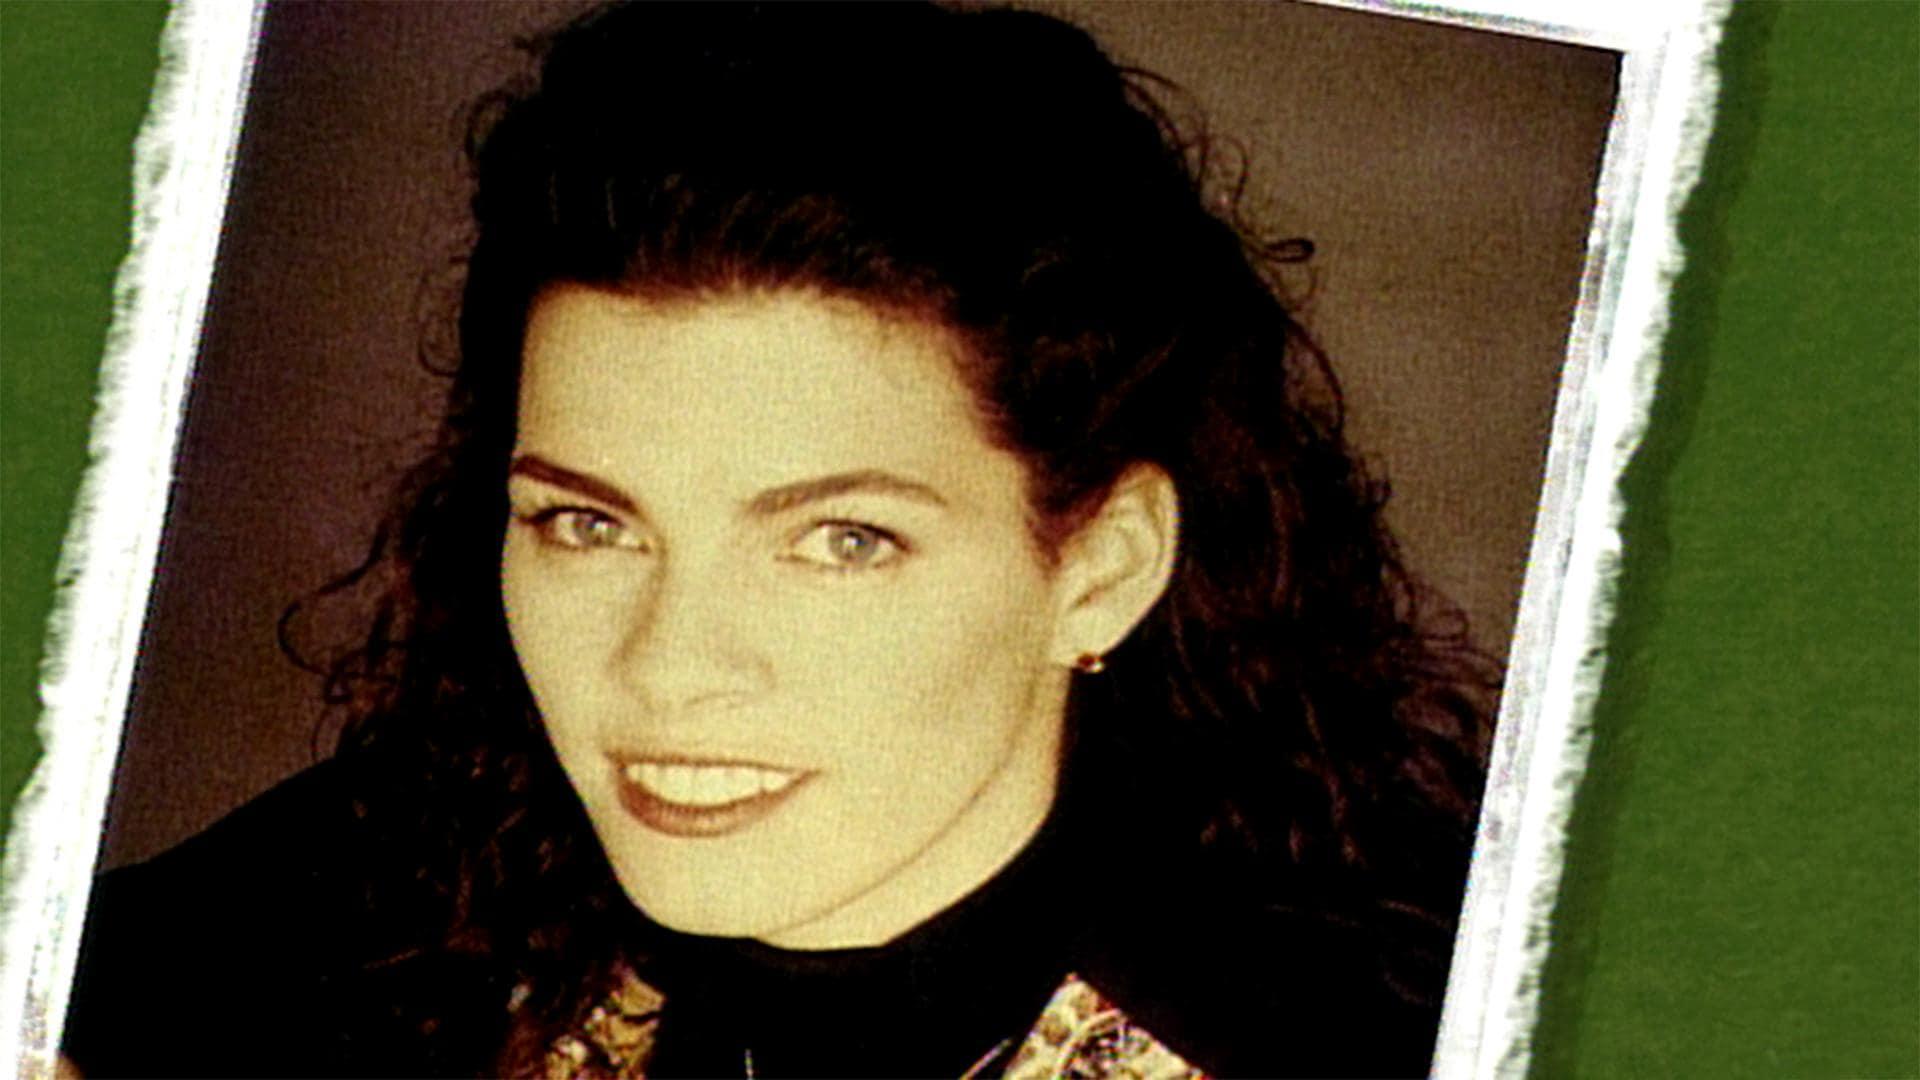 Nancy Kerrigan: March 12, 1994